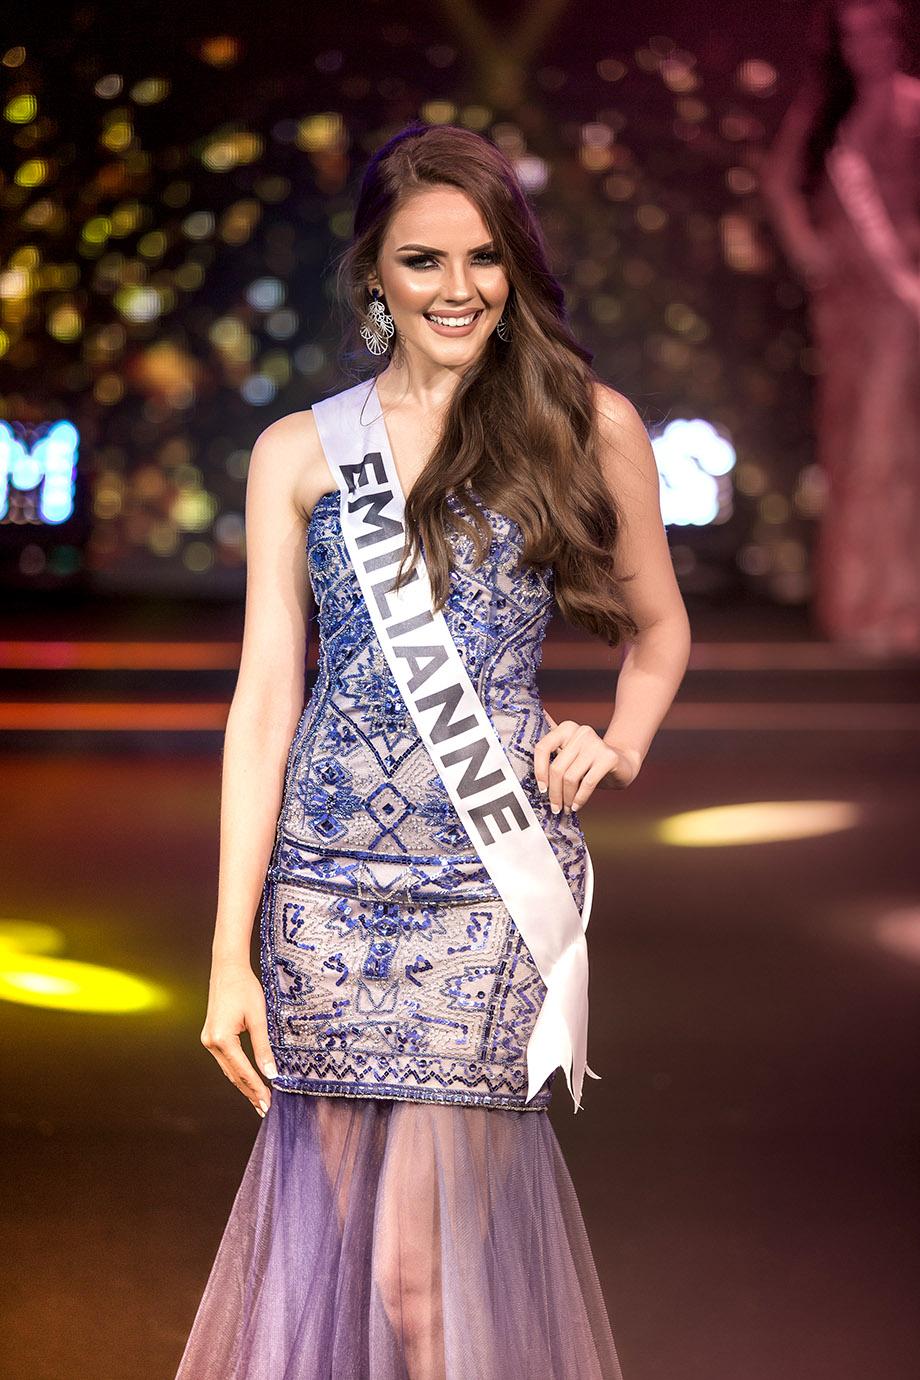 Blog Cris Moreira - Miss Fortaleza 2016 - 21